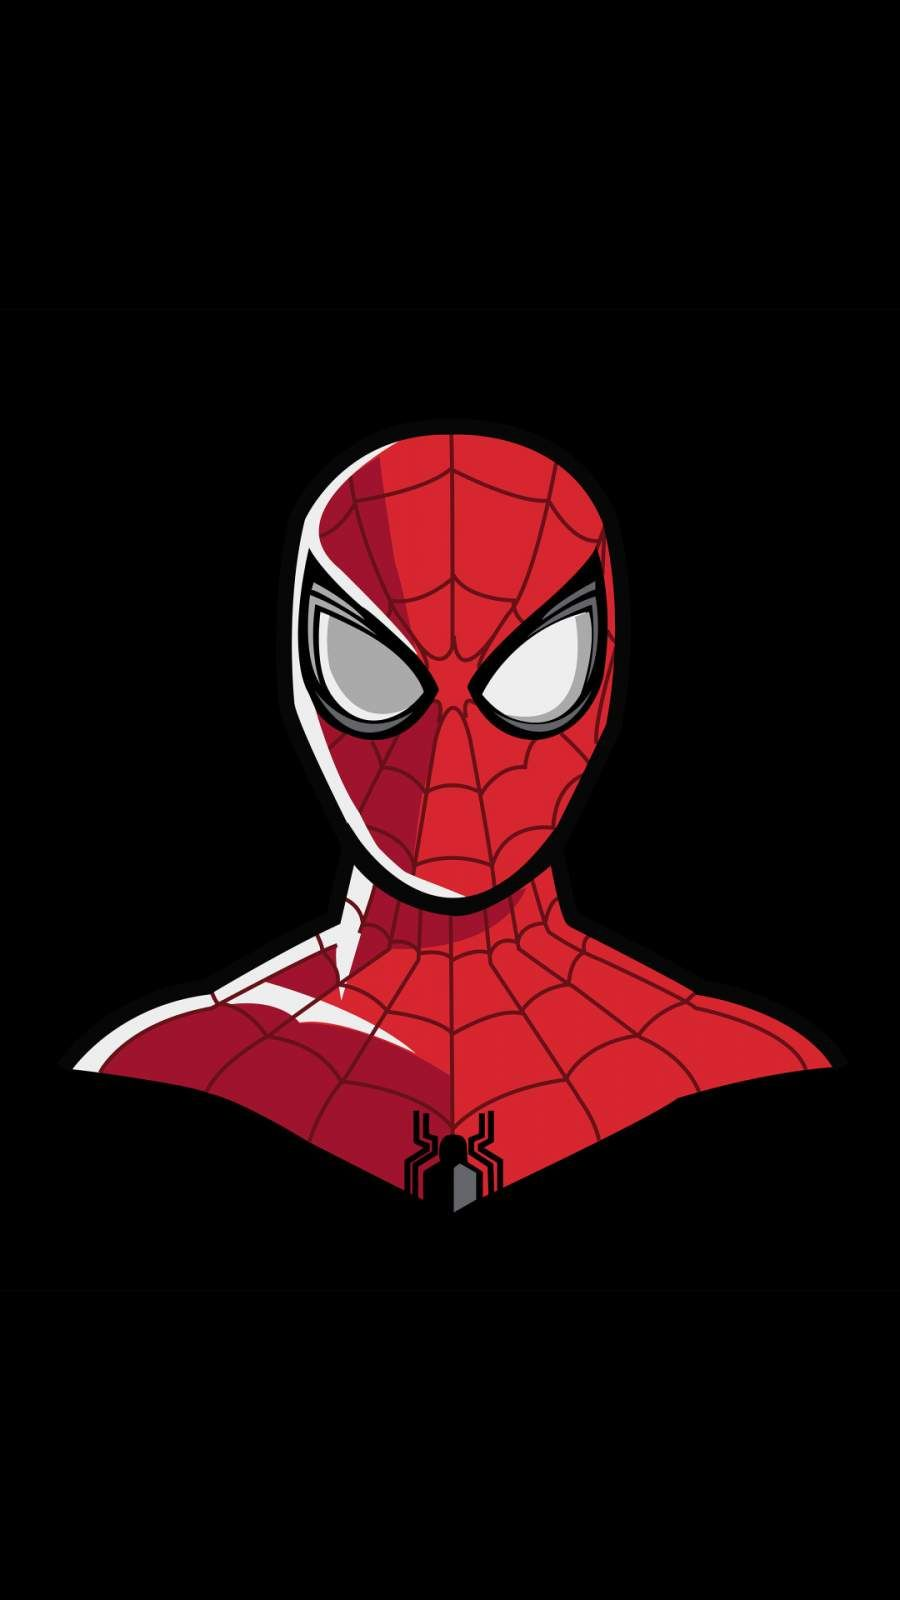 Spiderman 4k Minimal Iphone Wallpaper In 2020 Spiderman Artwork Spiderman Superhero Wallpaper